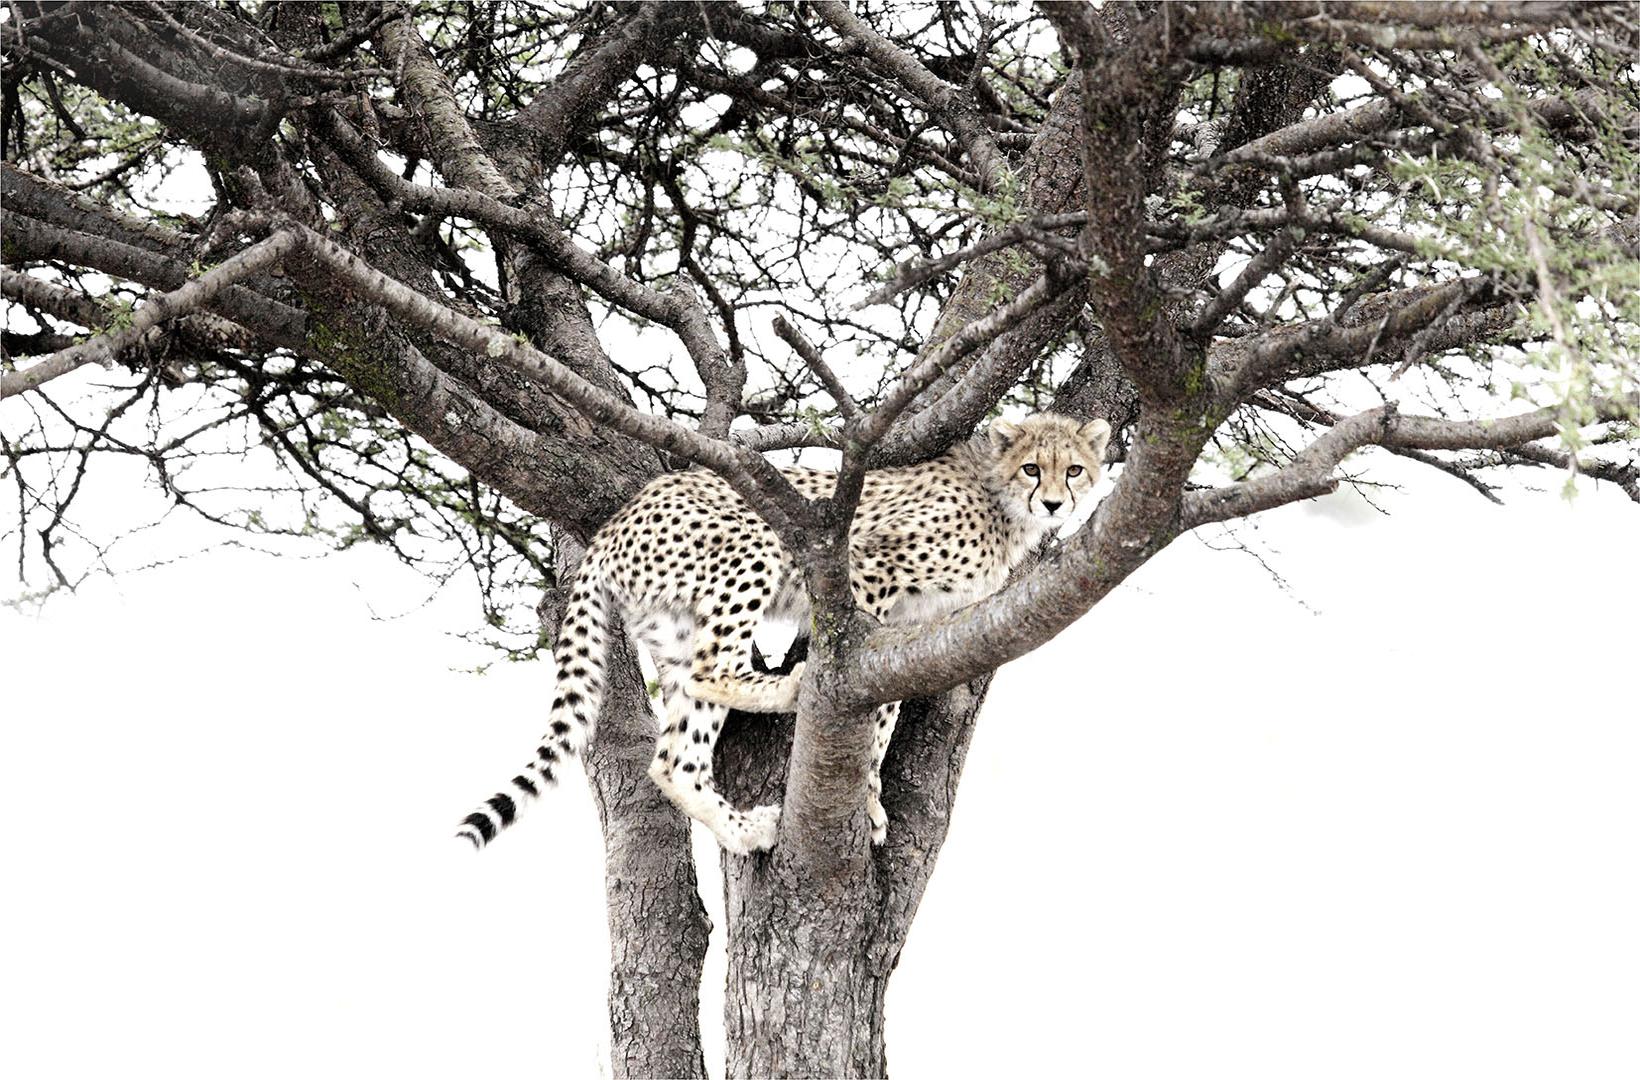 African cheetah cub climbs in to a tree in the Serengeti Tanzania